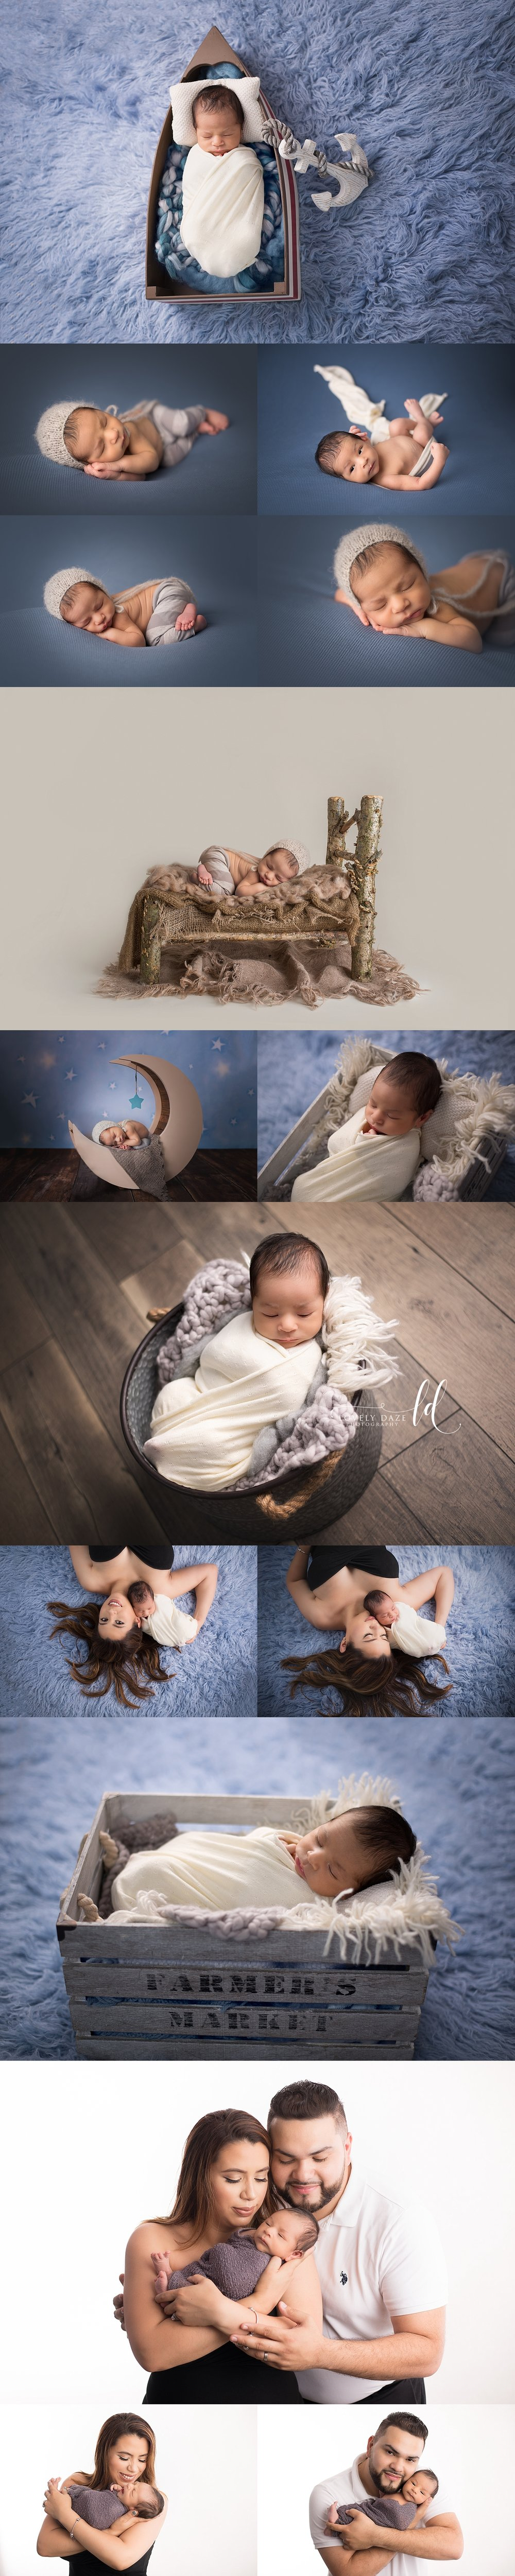 best nj newborn photographer baby boy blue lovely daze photography.jpg